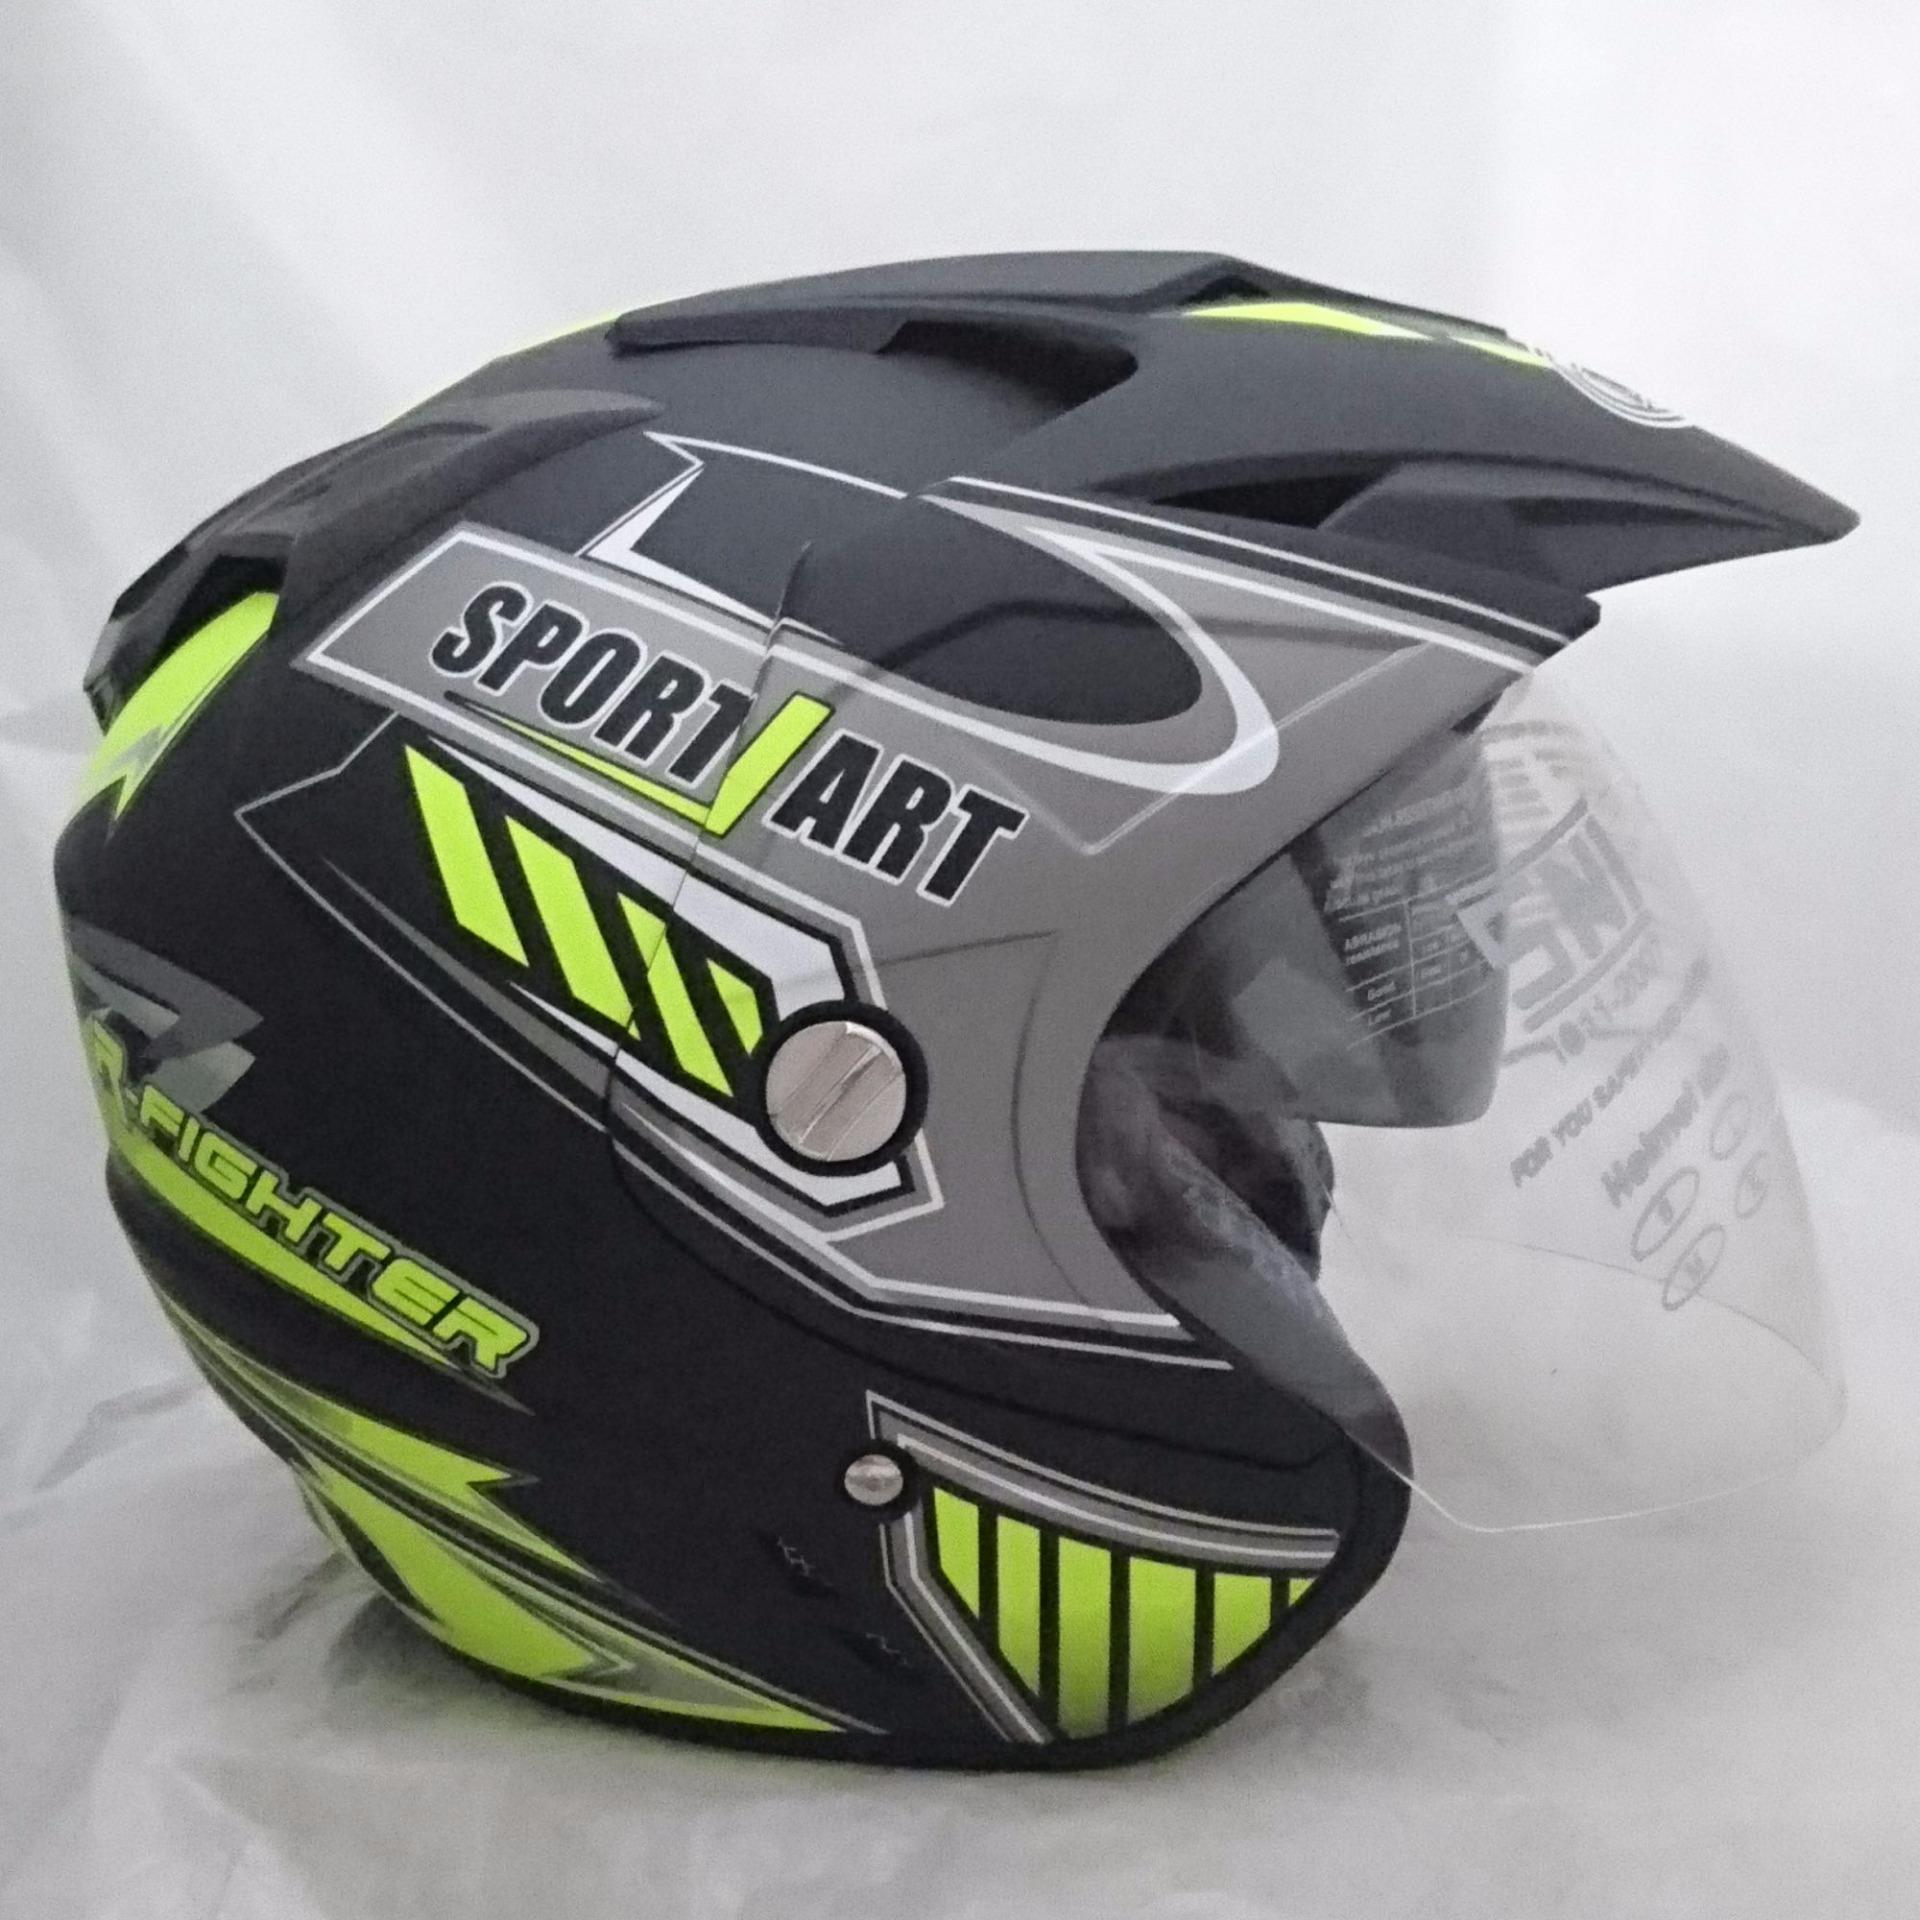 Lihat Helm Ltd Sport Dan Harga Terbaru Informasi Terkini G Fresh Spray Pengharum Deodoriser Dmn 2 Kaca Double Visor Black Doff Yellow